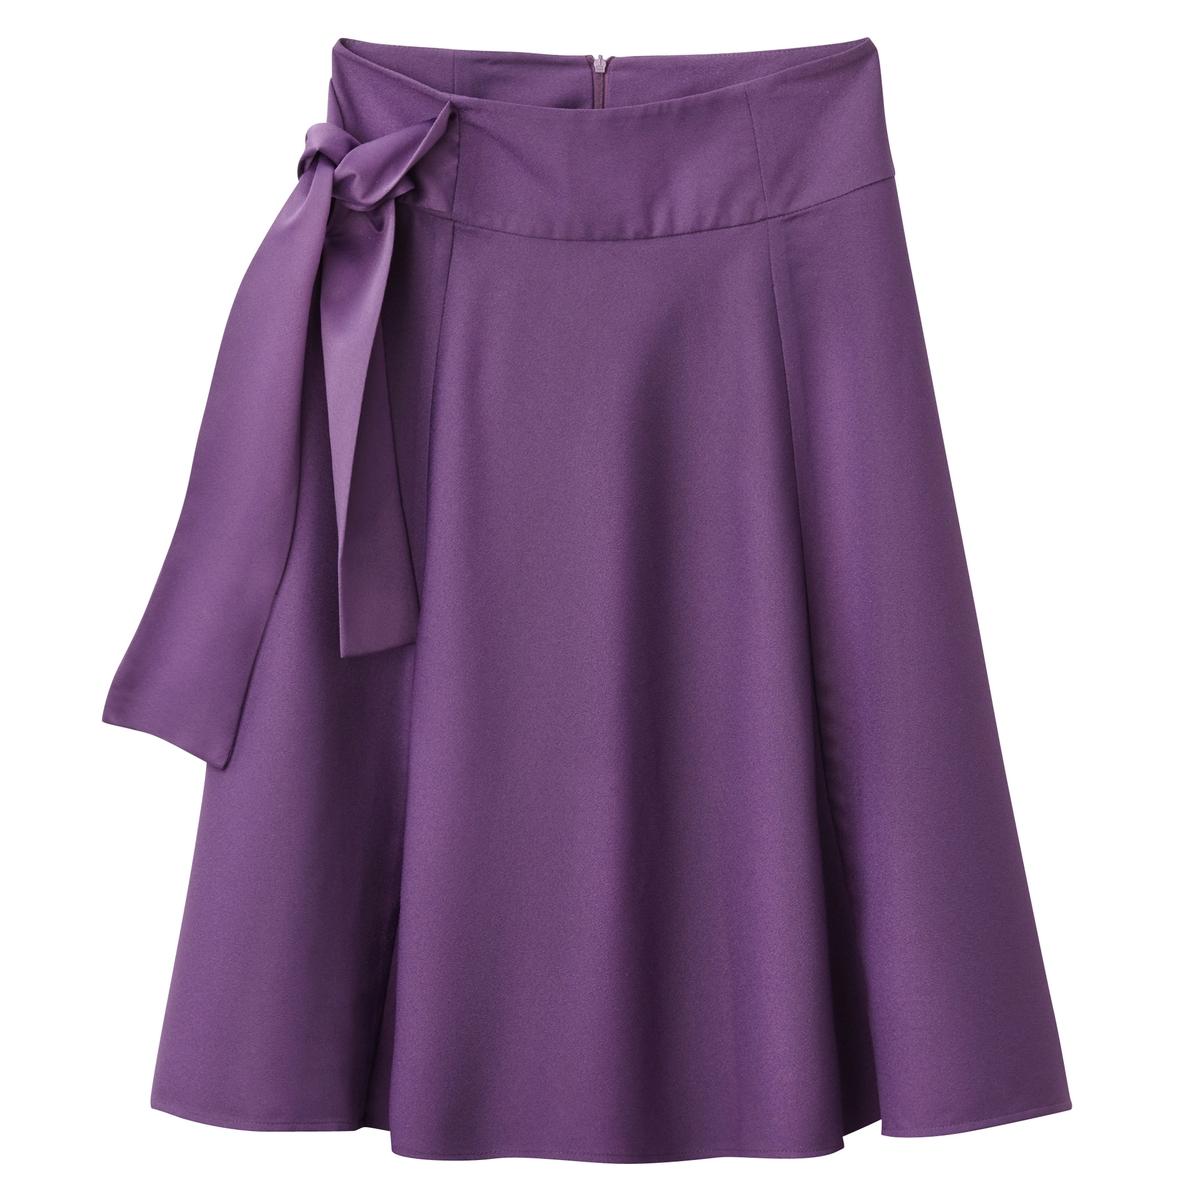 Falda midi con lazada a un lado